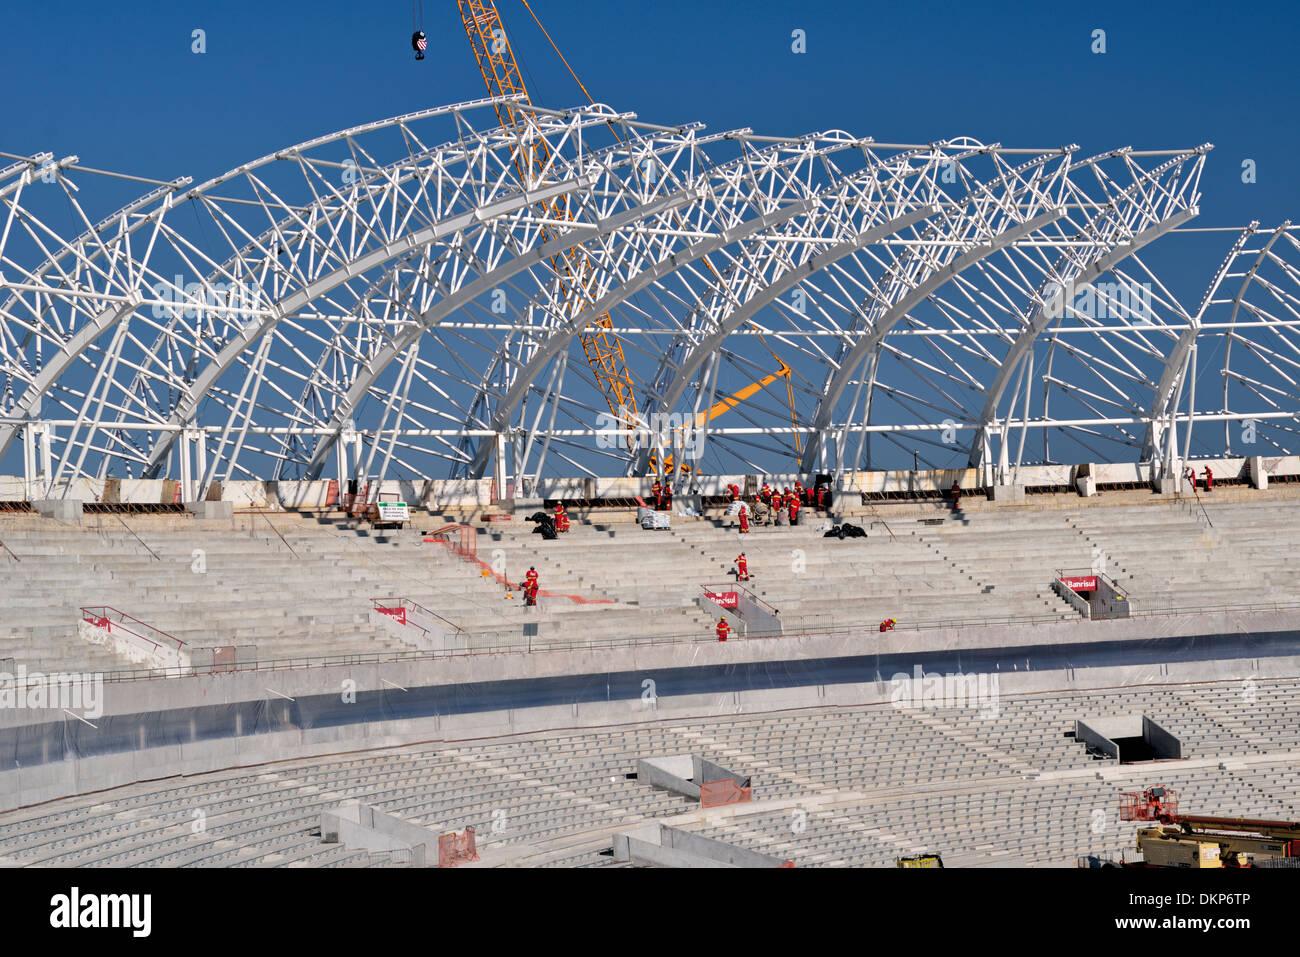 Brazil, Porto Alegre: Construction phase of the World Cup Stadium Beira Rio of Sports Club Internacional (July 2013) - Stock Image